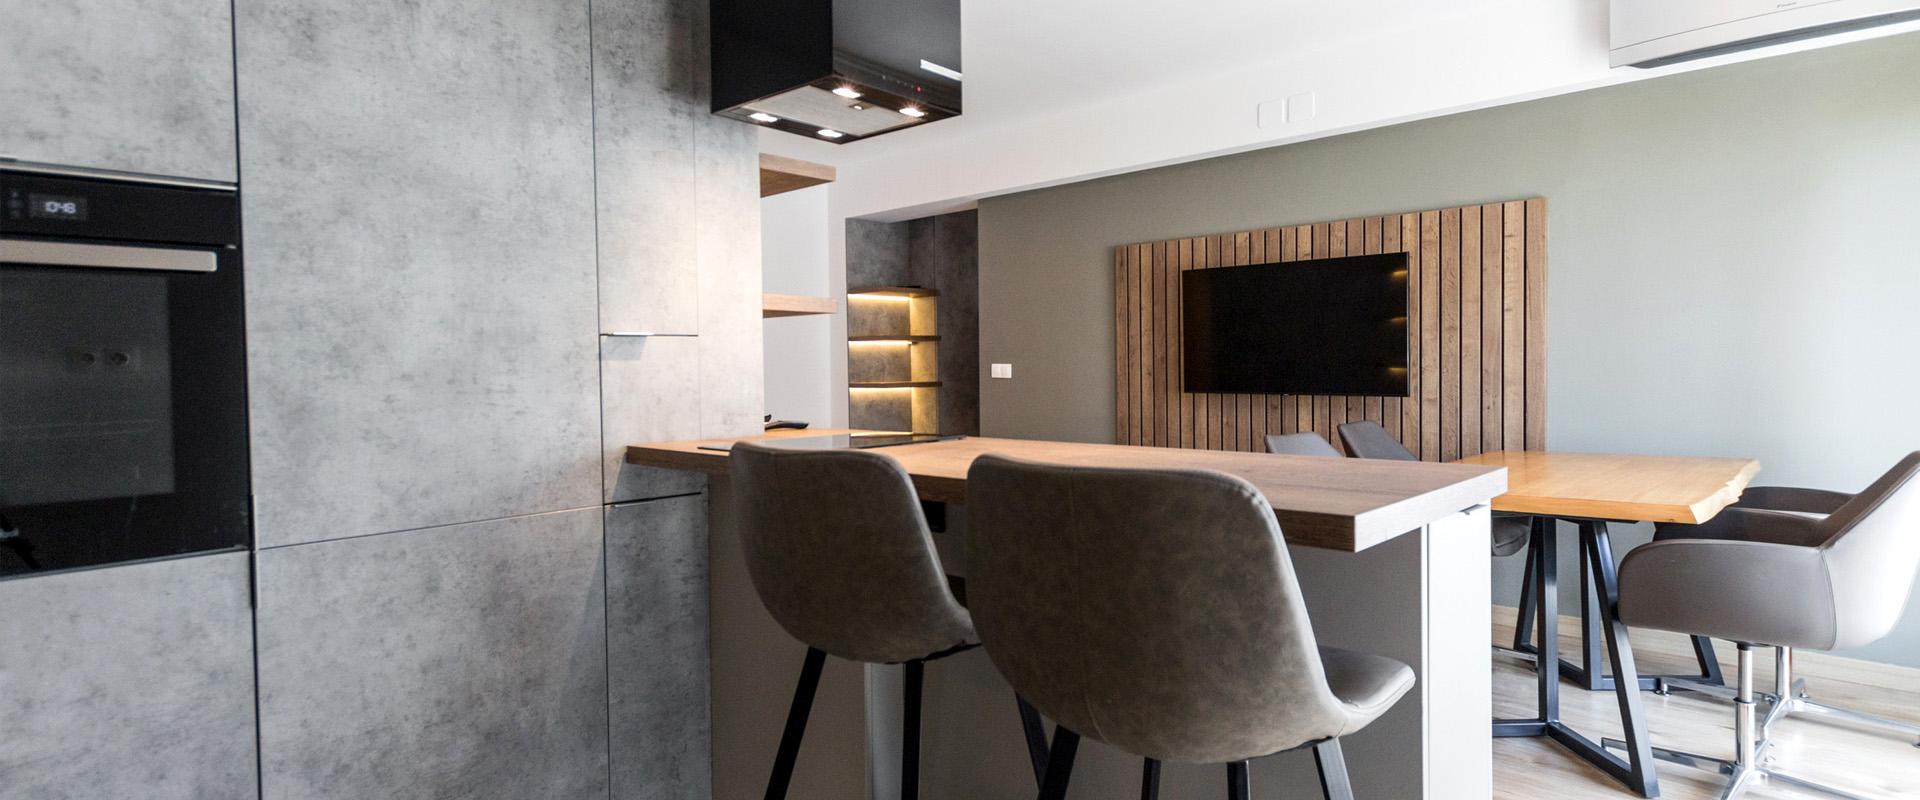 Inchiriere apartament 3 camere   Premium, Parcare, Design   Belvedere Residence [ID: 1196065]